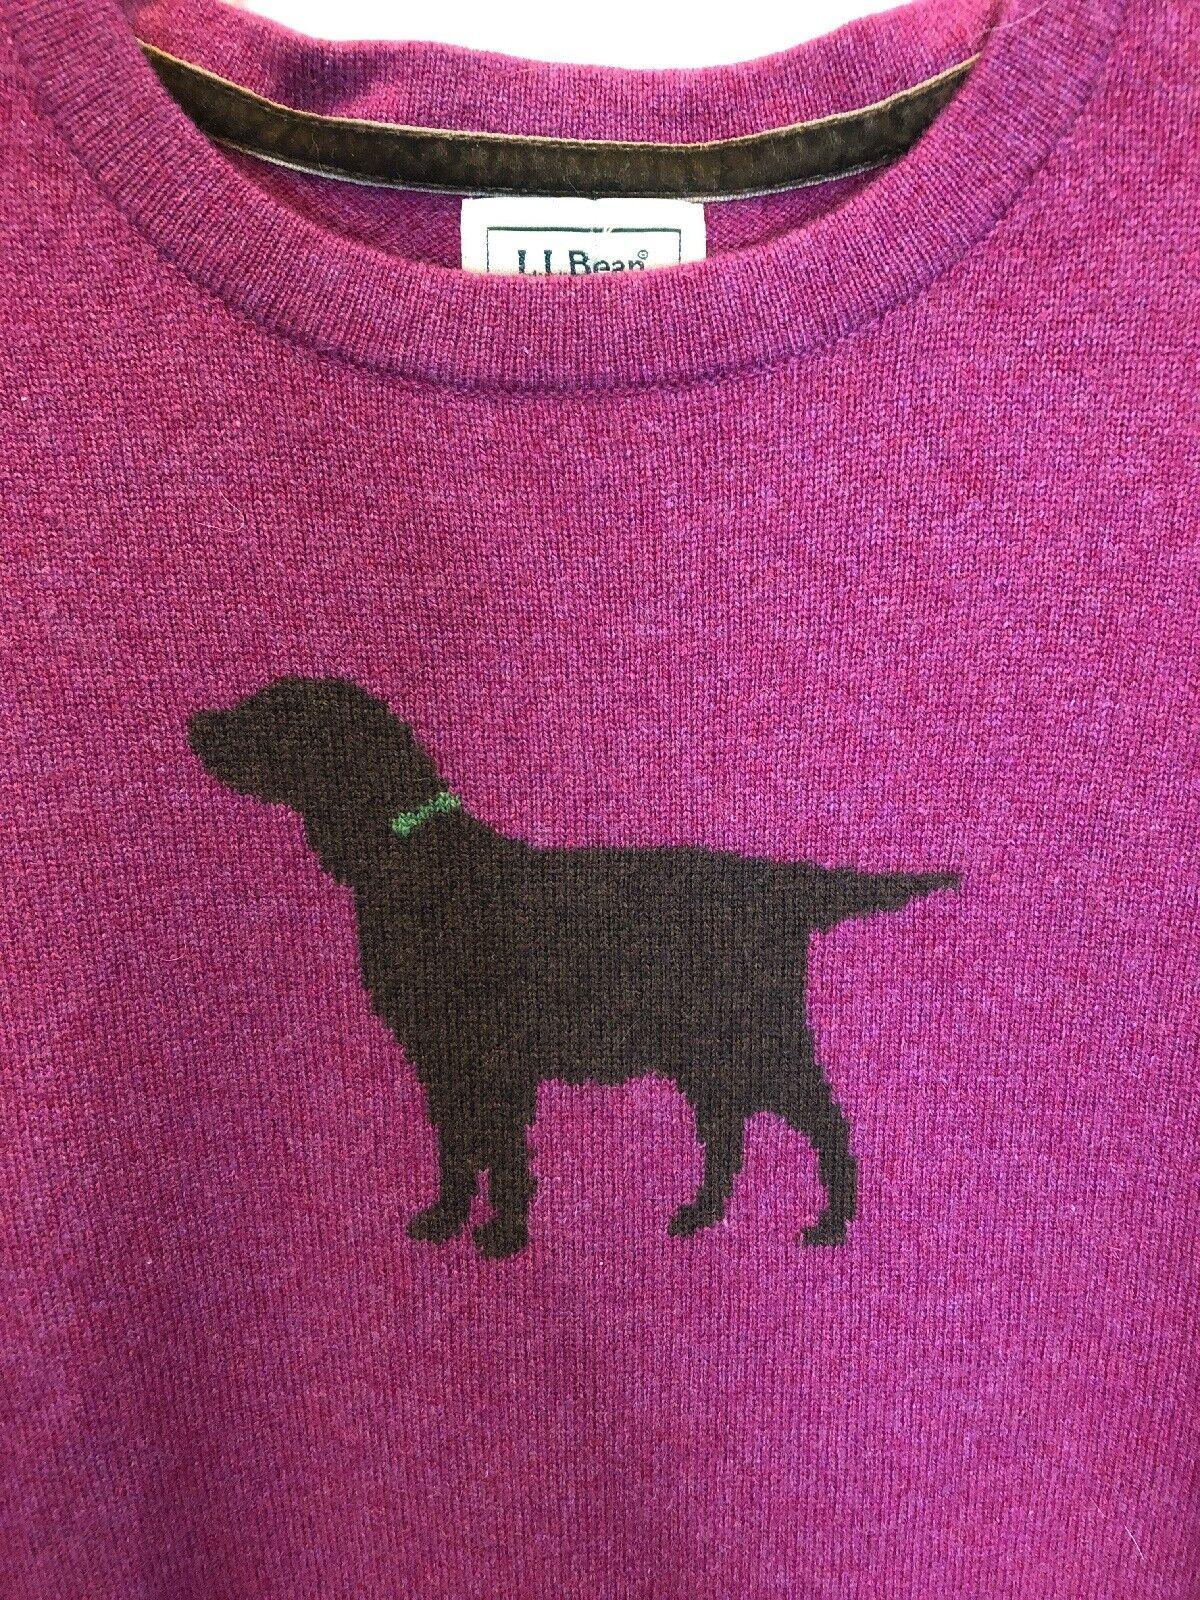 199. L L Bean Intarsia Dog Spaniel Cashmere Pull Flawless S